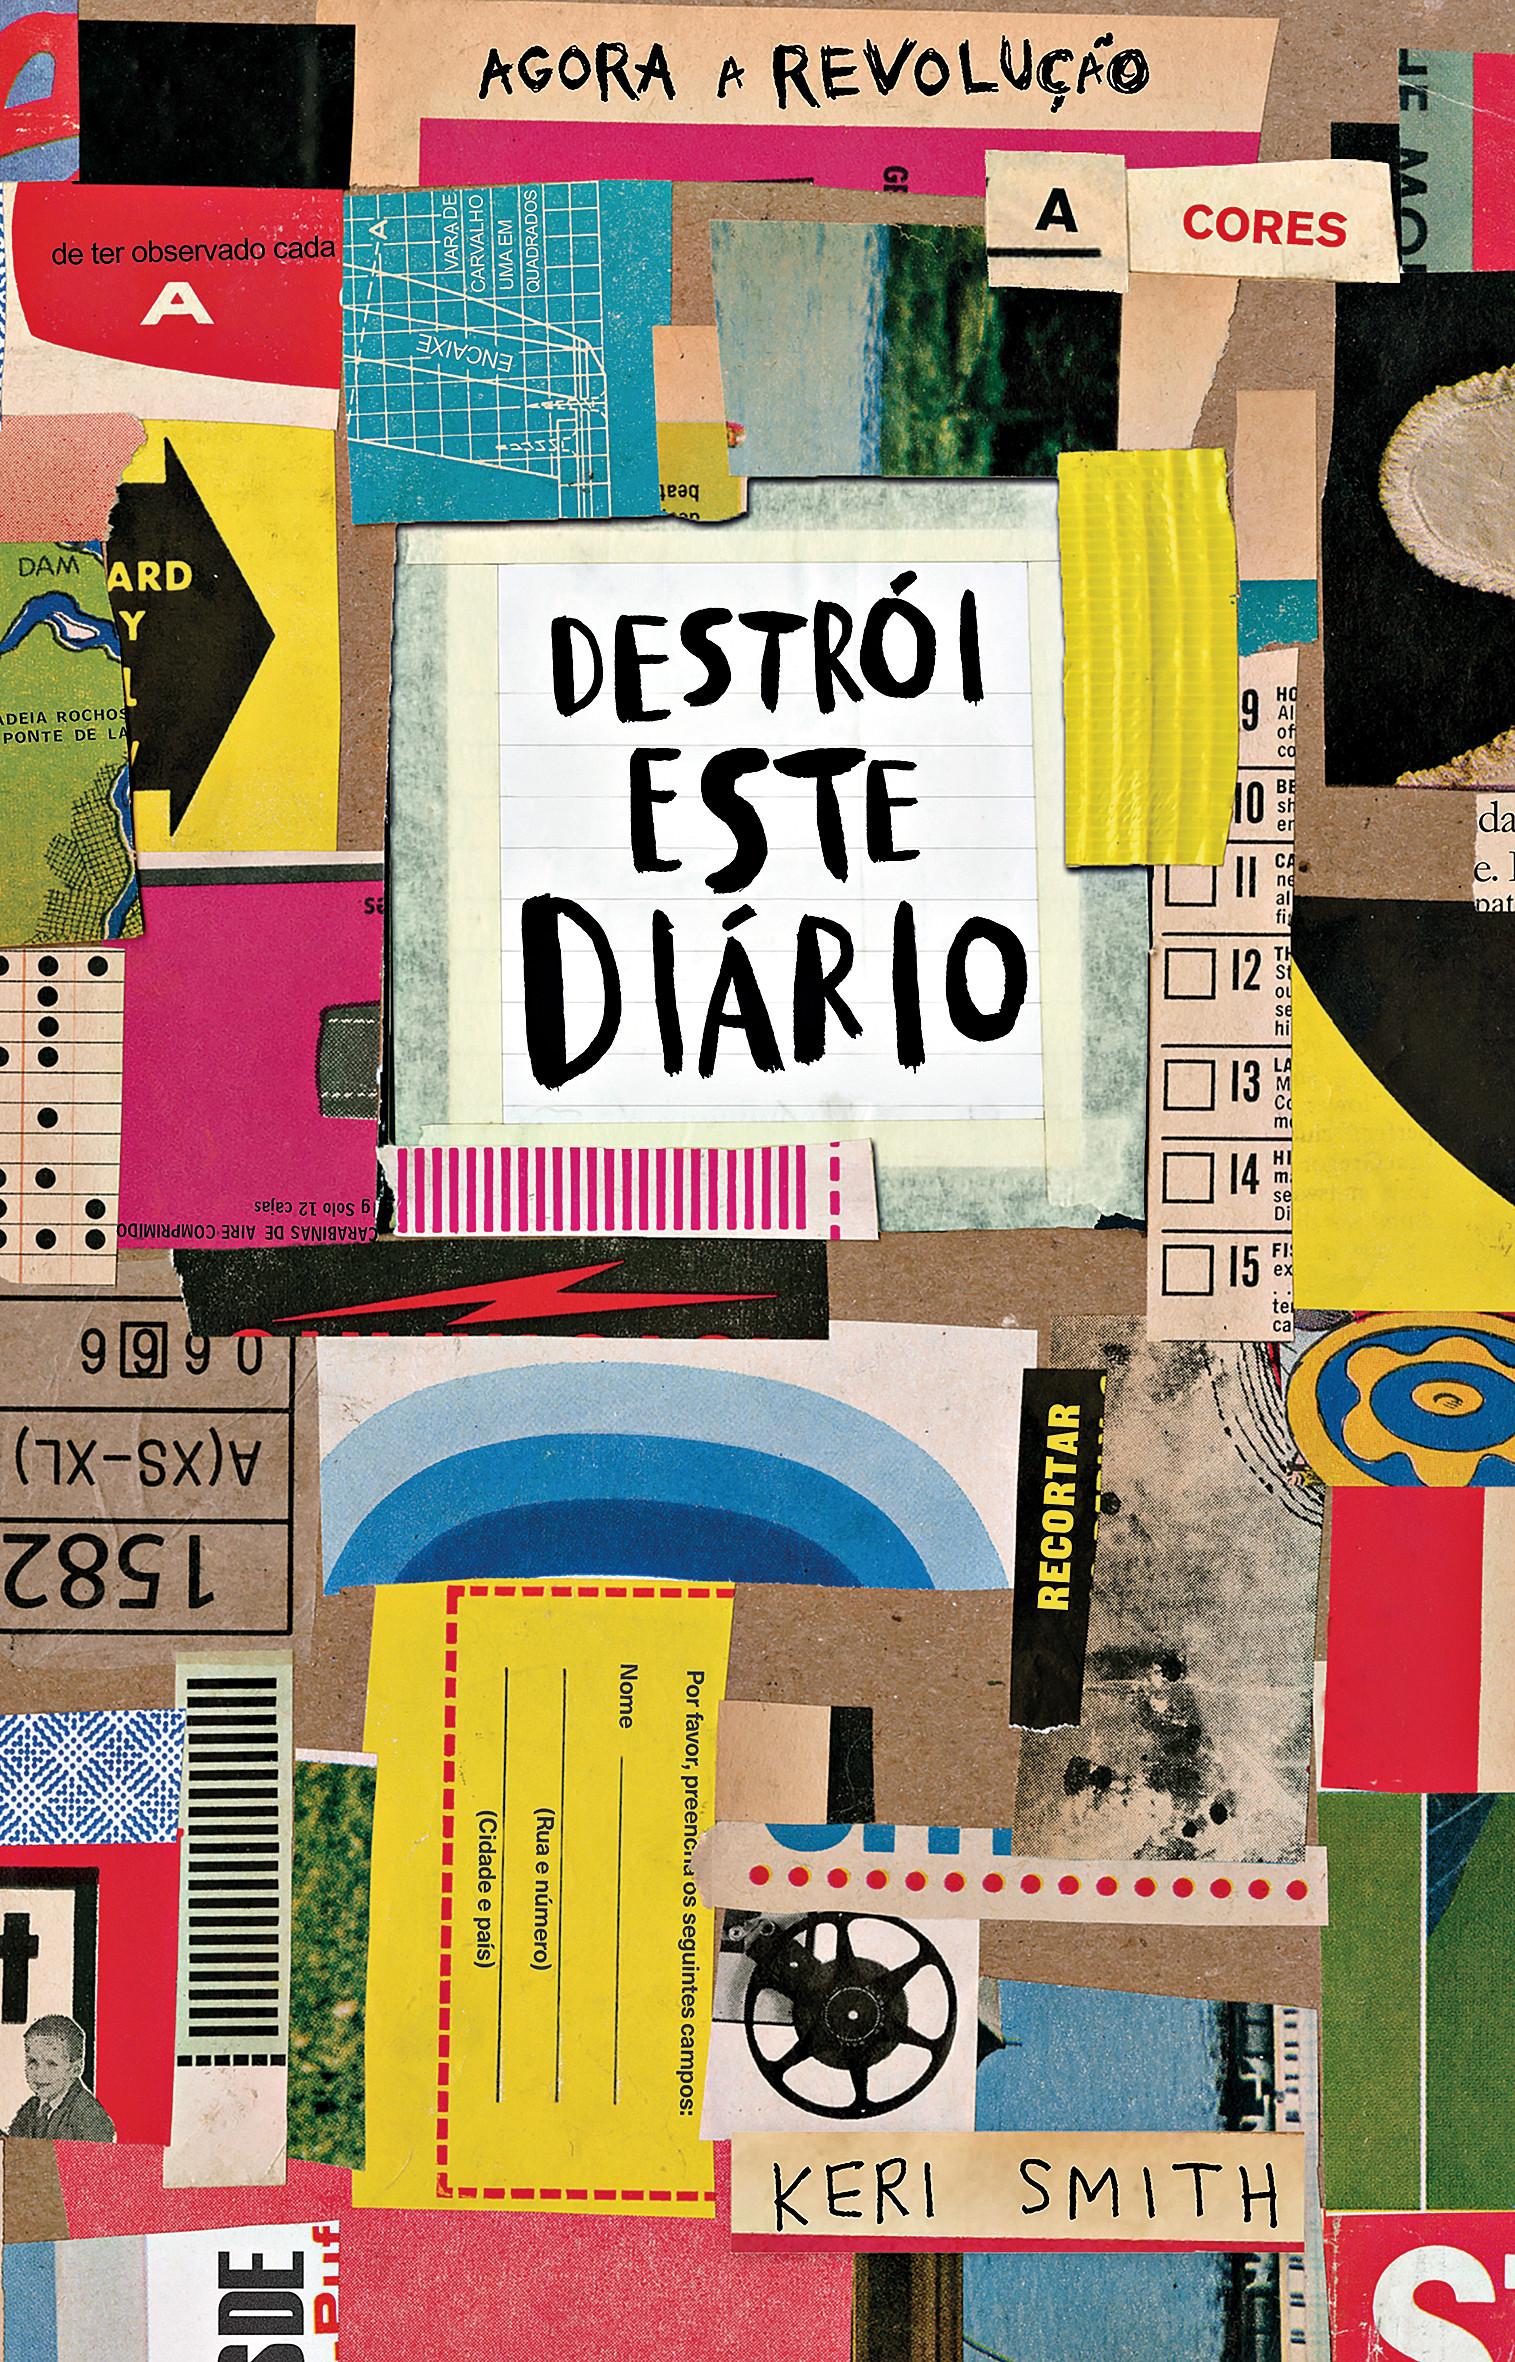 «Destrói este Diário», de Keri Smith